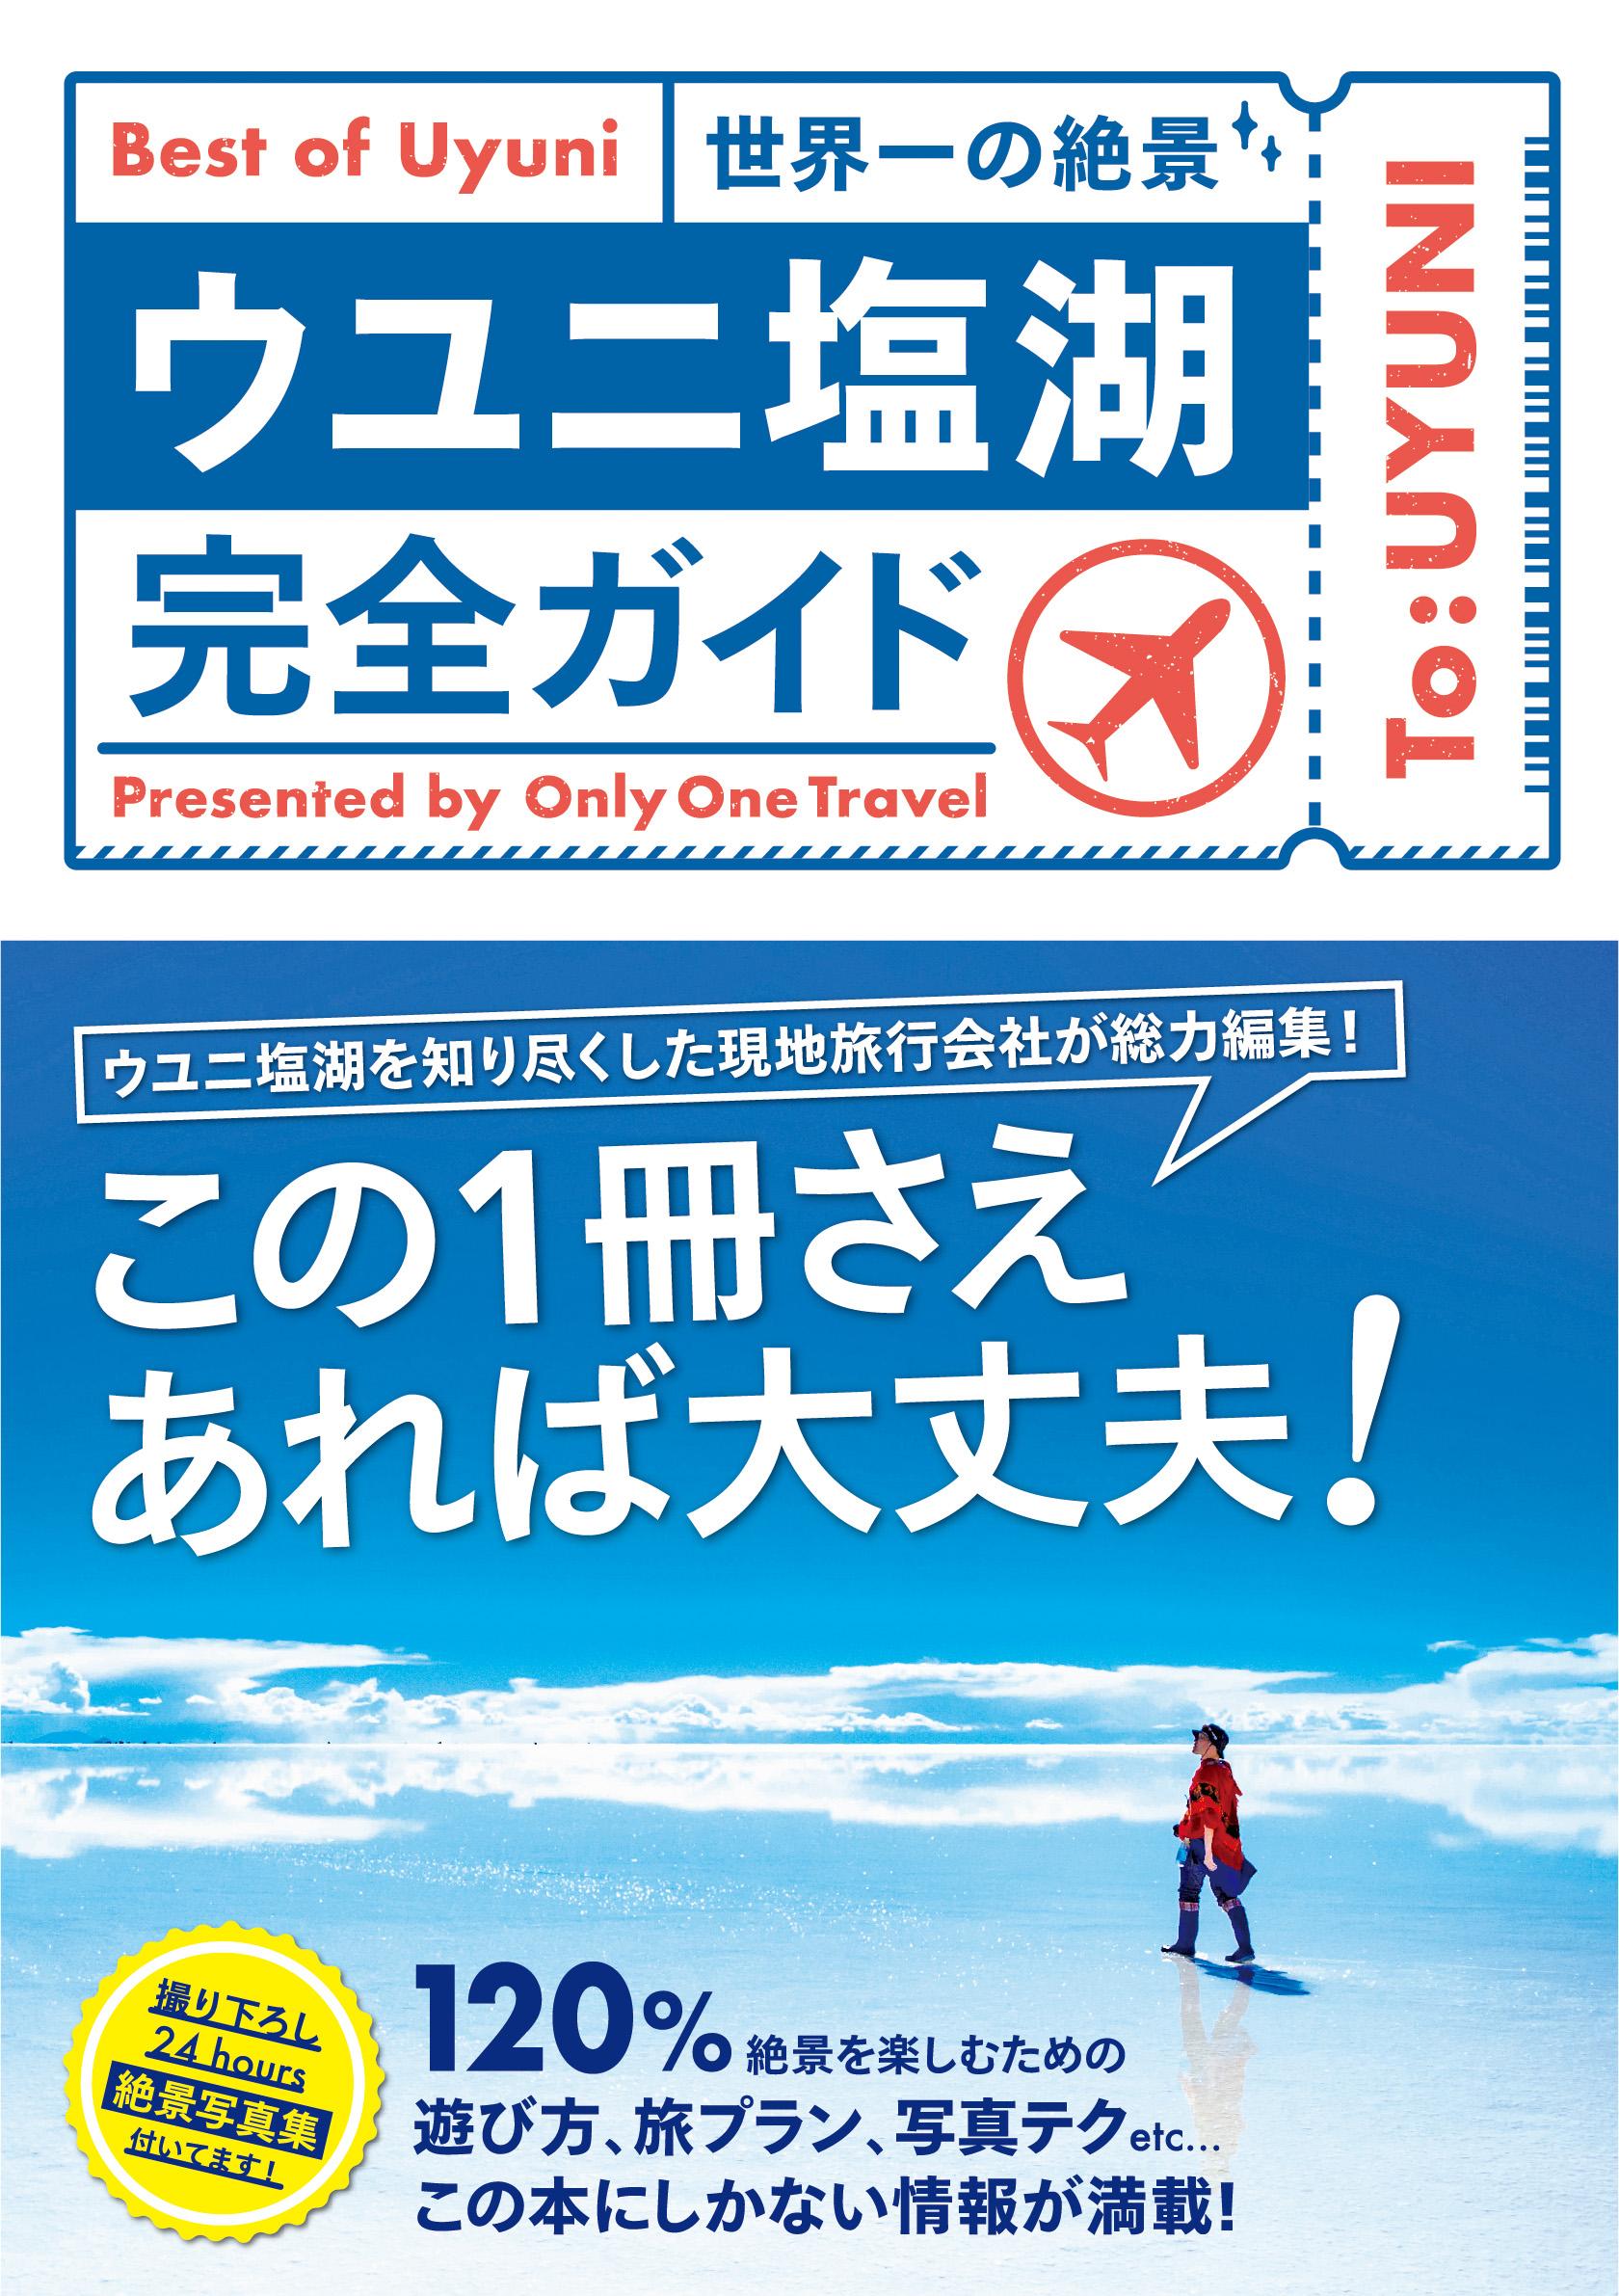 「Only One Travelの『ウユニ塩湖完全ガイド』が発売されました!」記事アイキャッチ画像